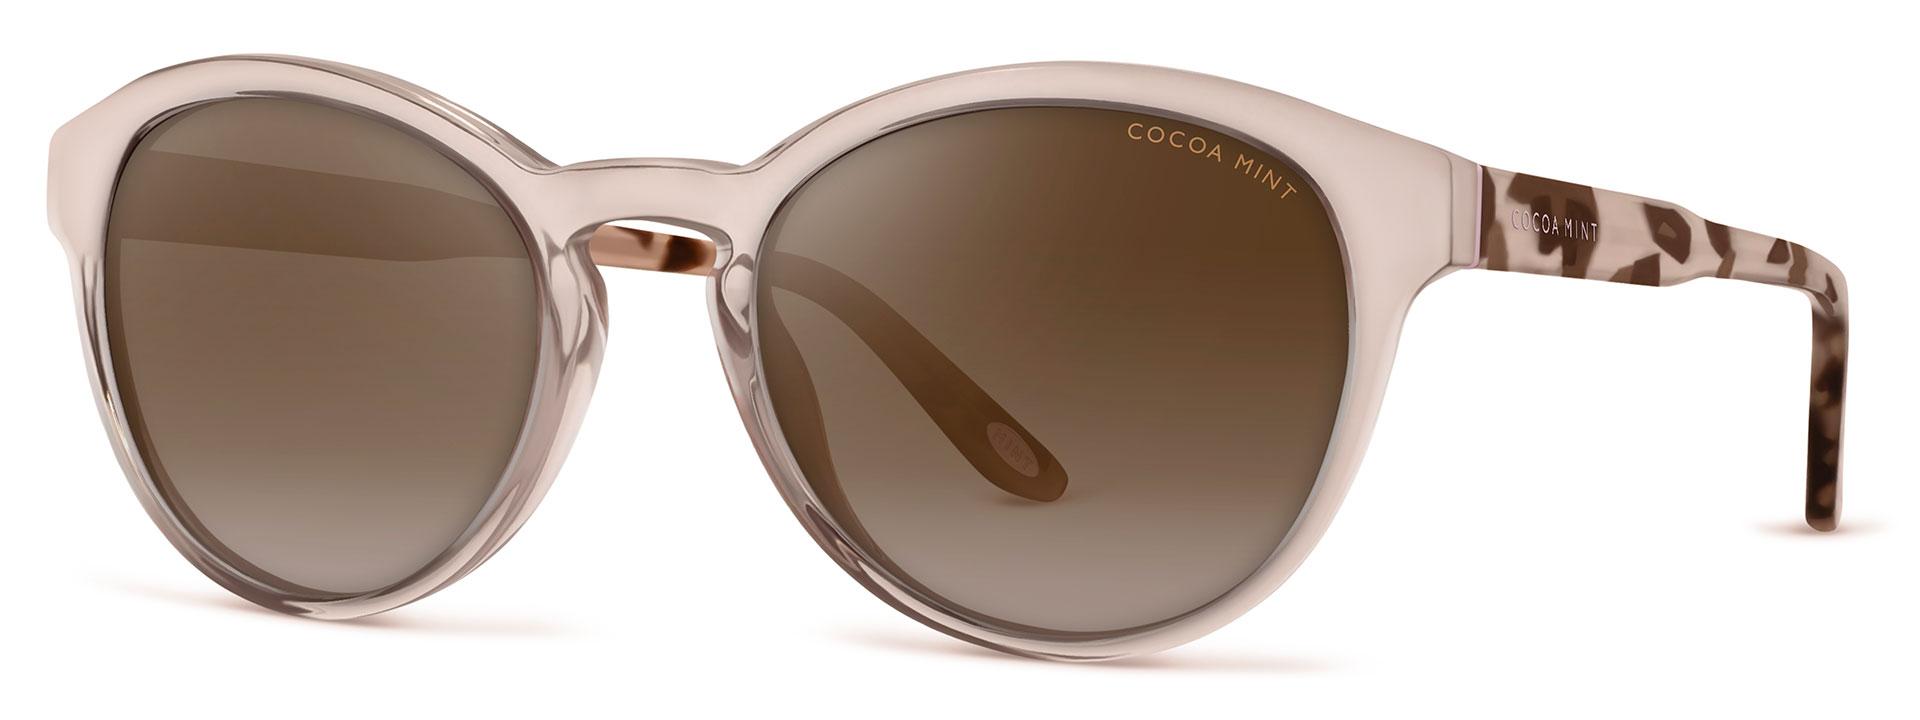 Cocoa Mint Sun Glasses - Blush Crystal - Tortoiseshell - CMS2062-C1